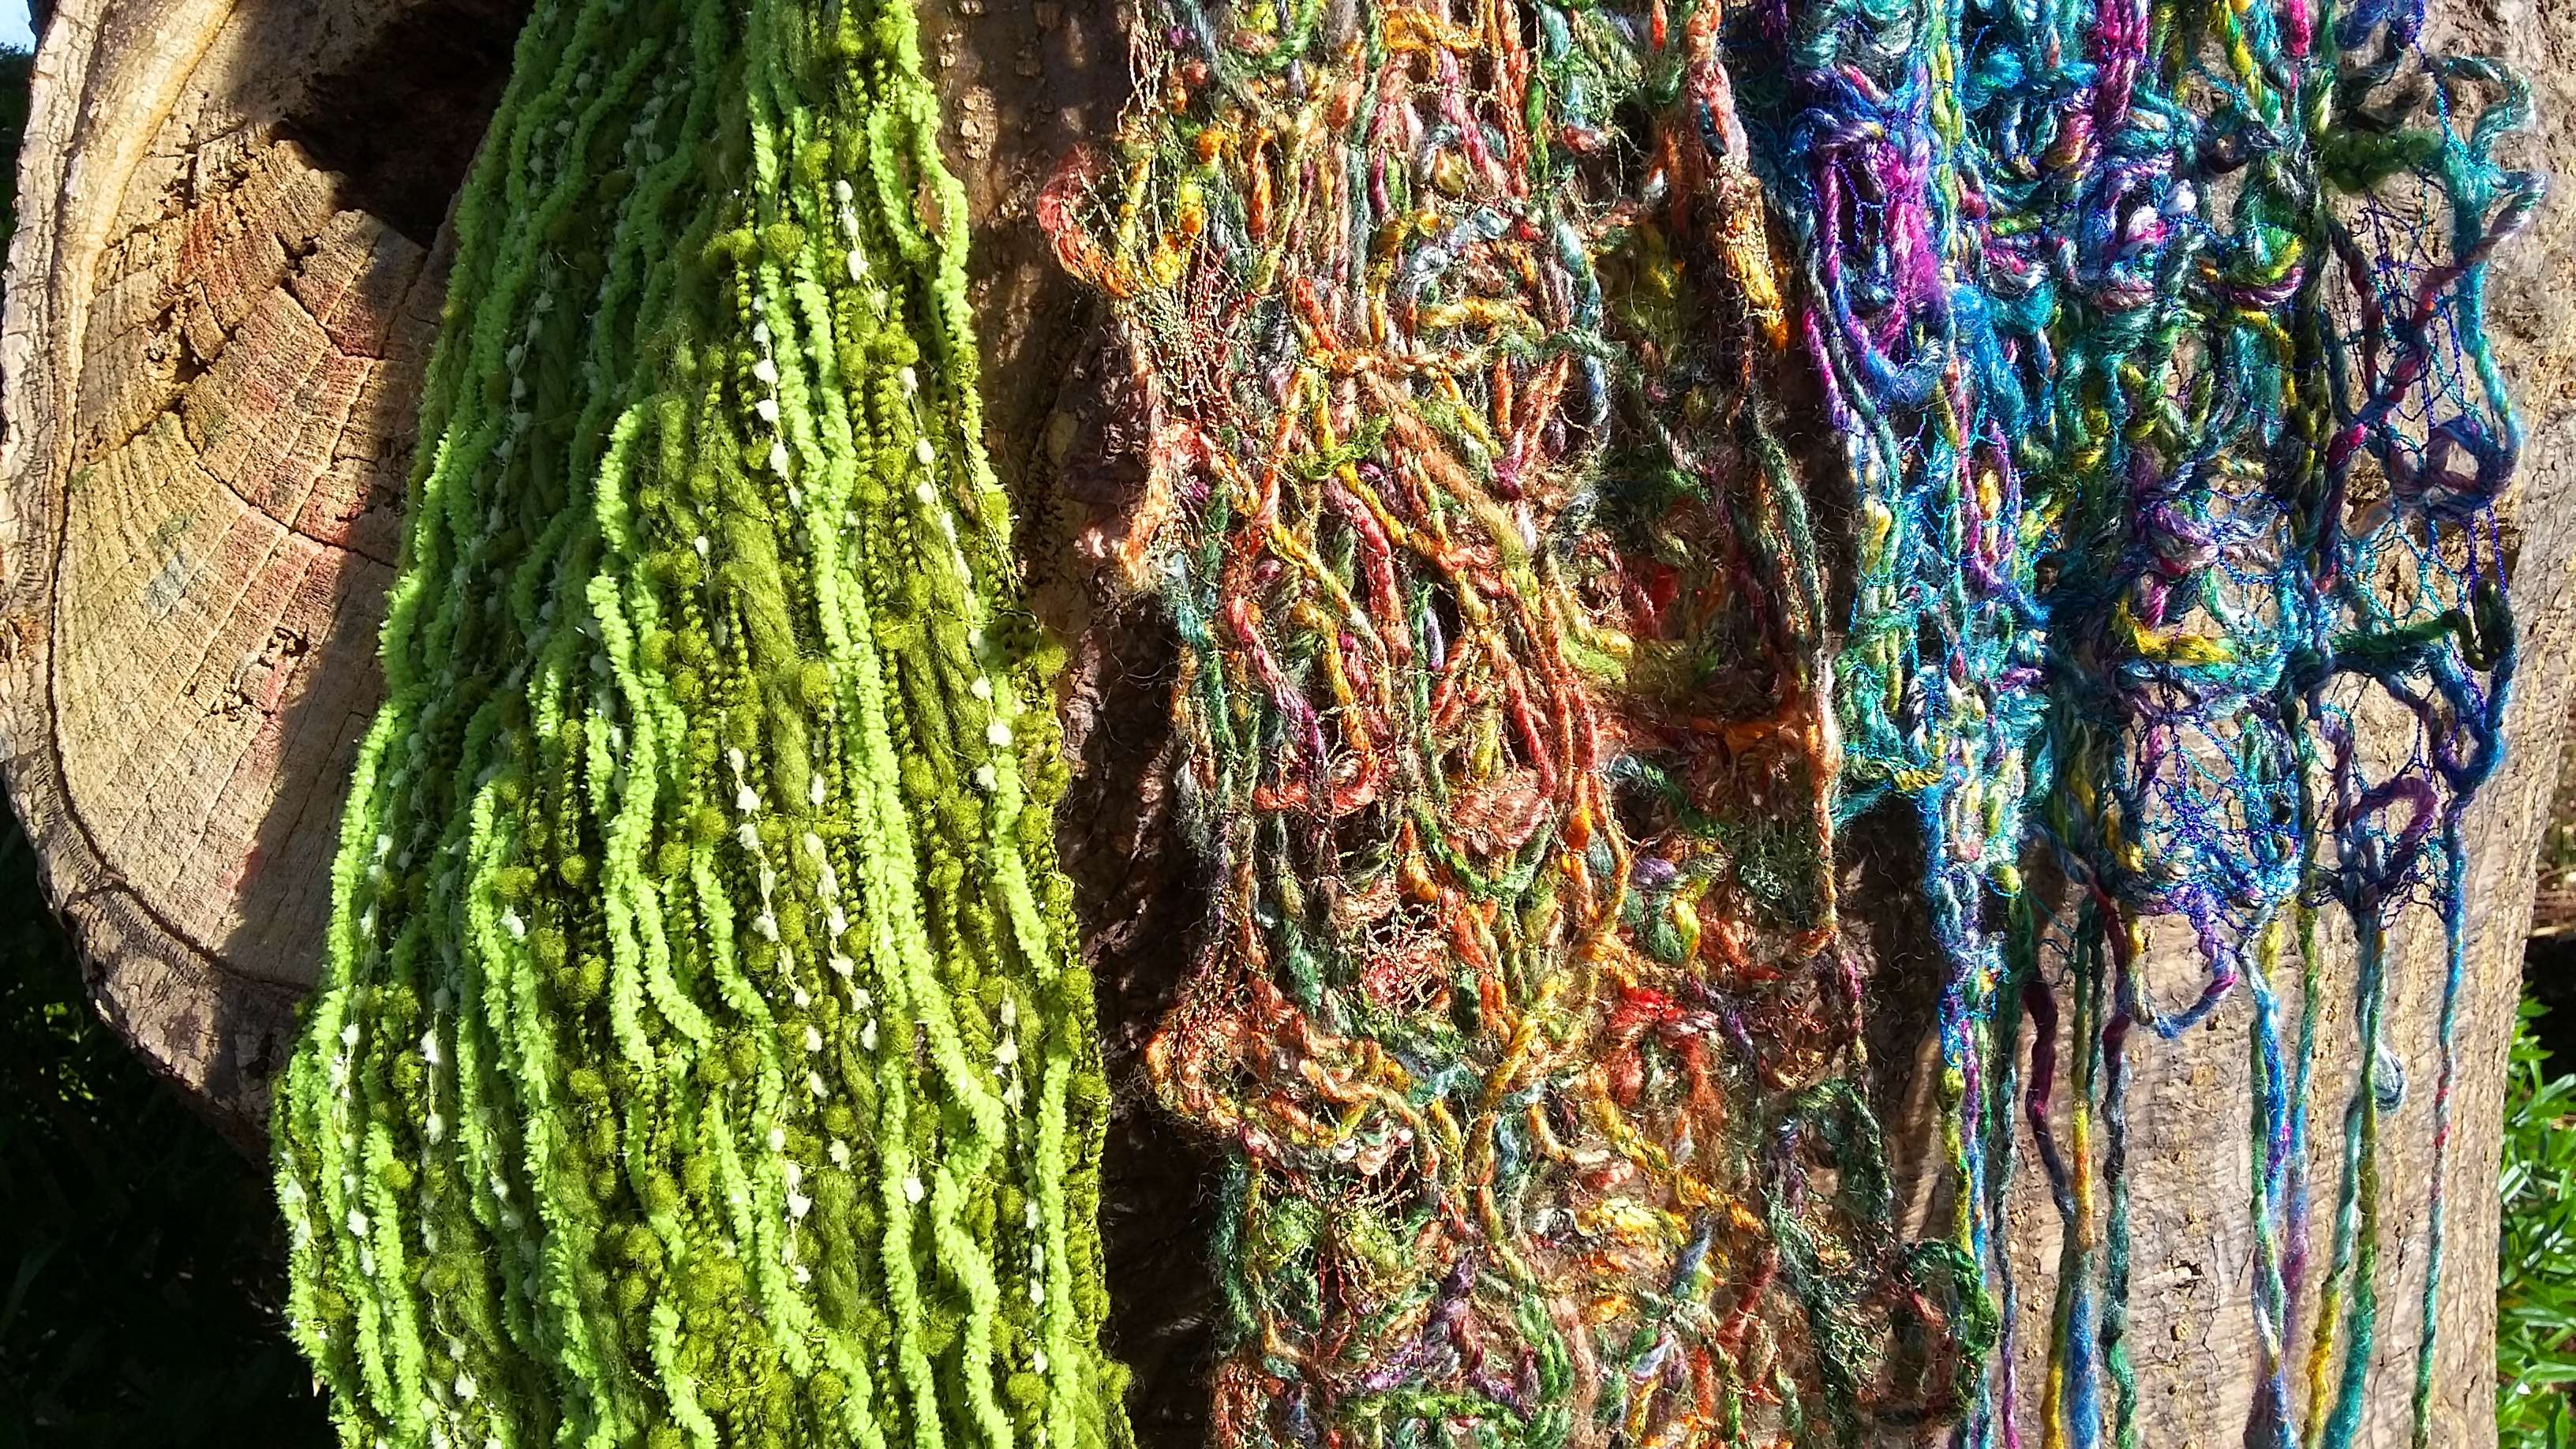 BSS: Freeform Stitched Scarf